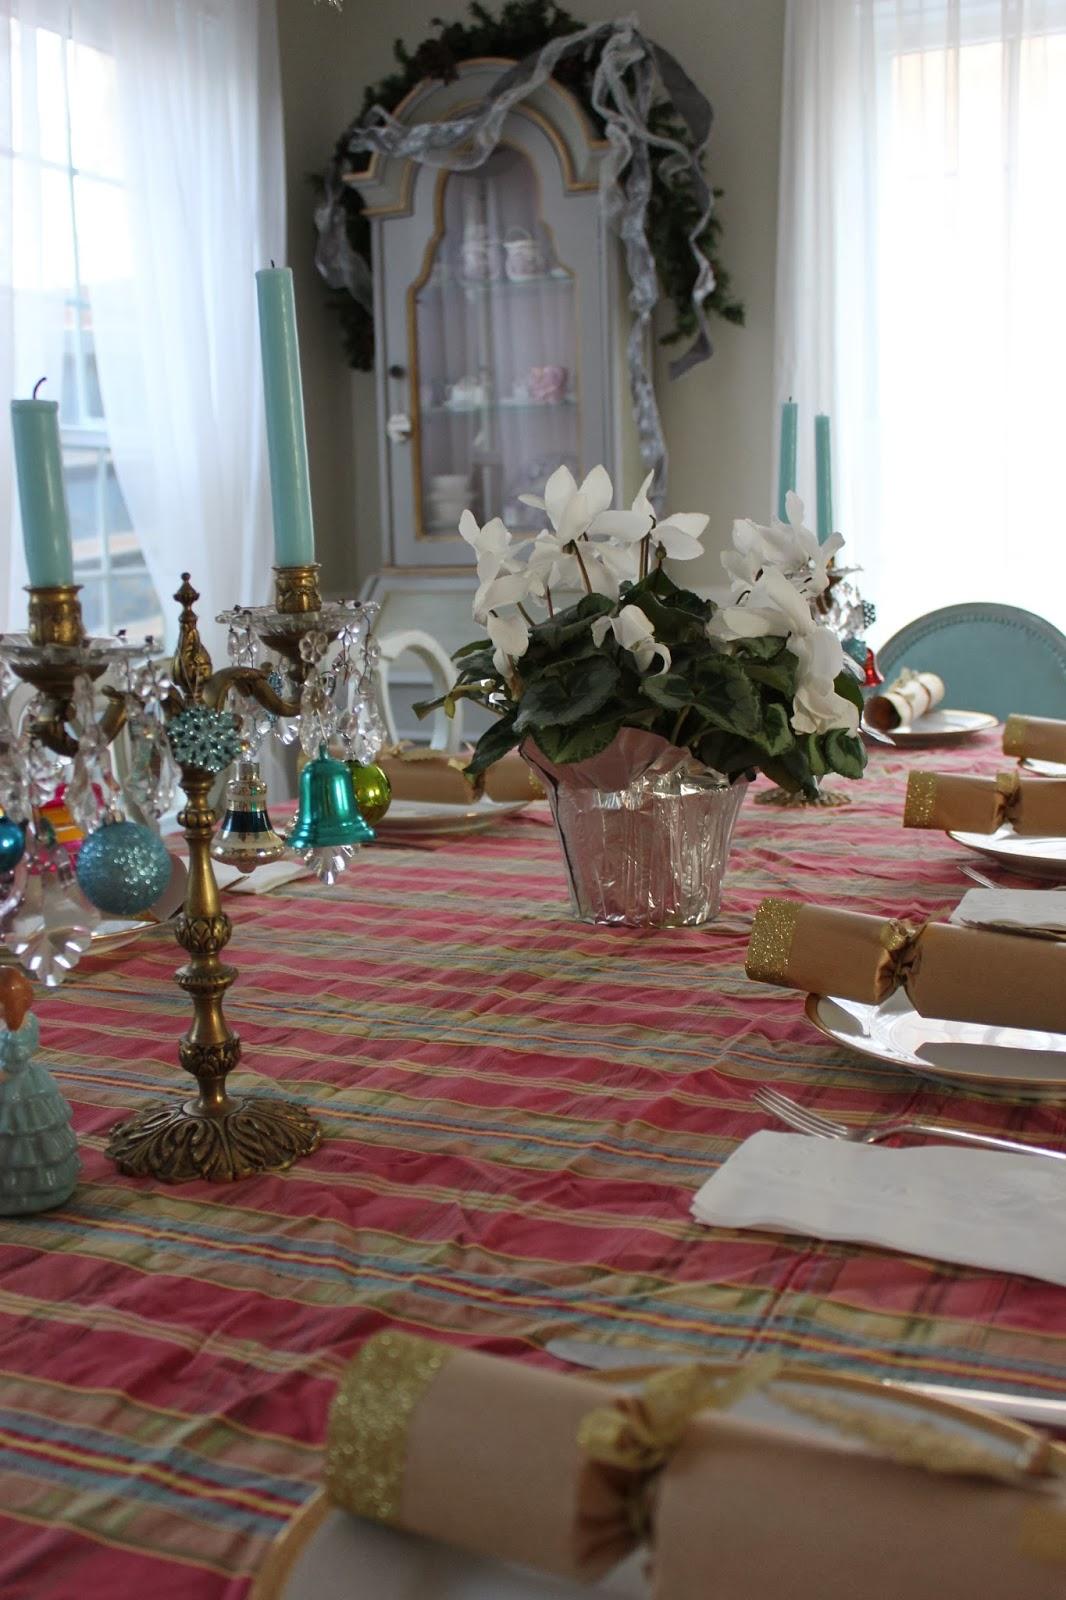 Maison Decor: Christmas Roundup